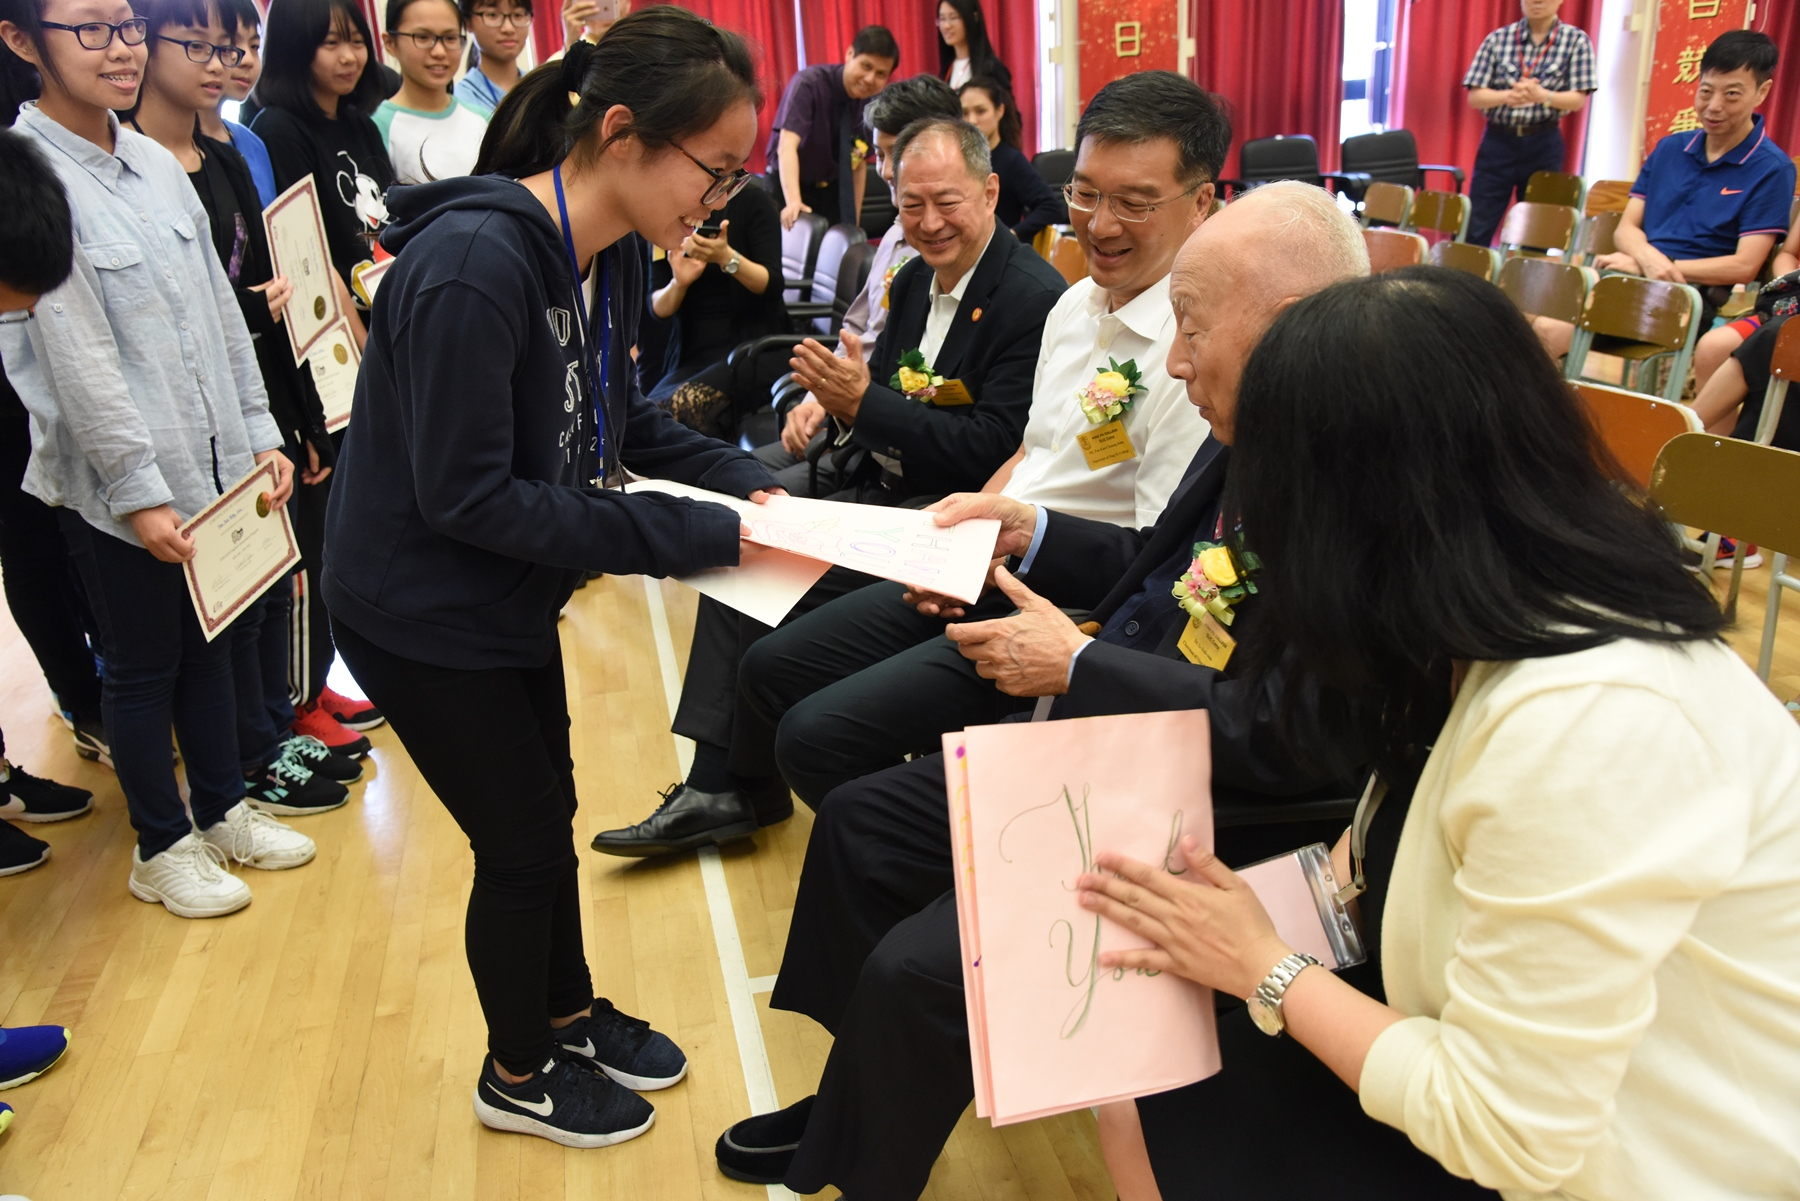 http://www.npc.edu.hk/sites/default/files/dsc_0290.jpg